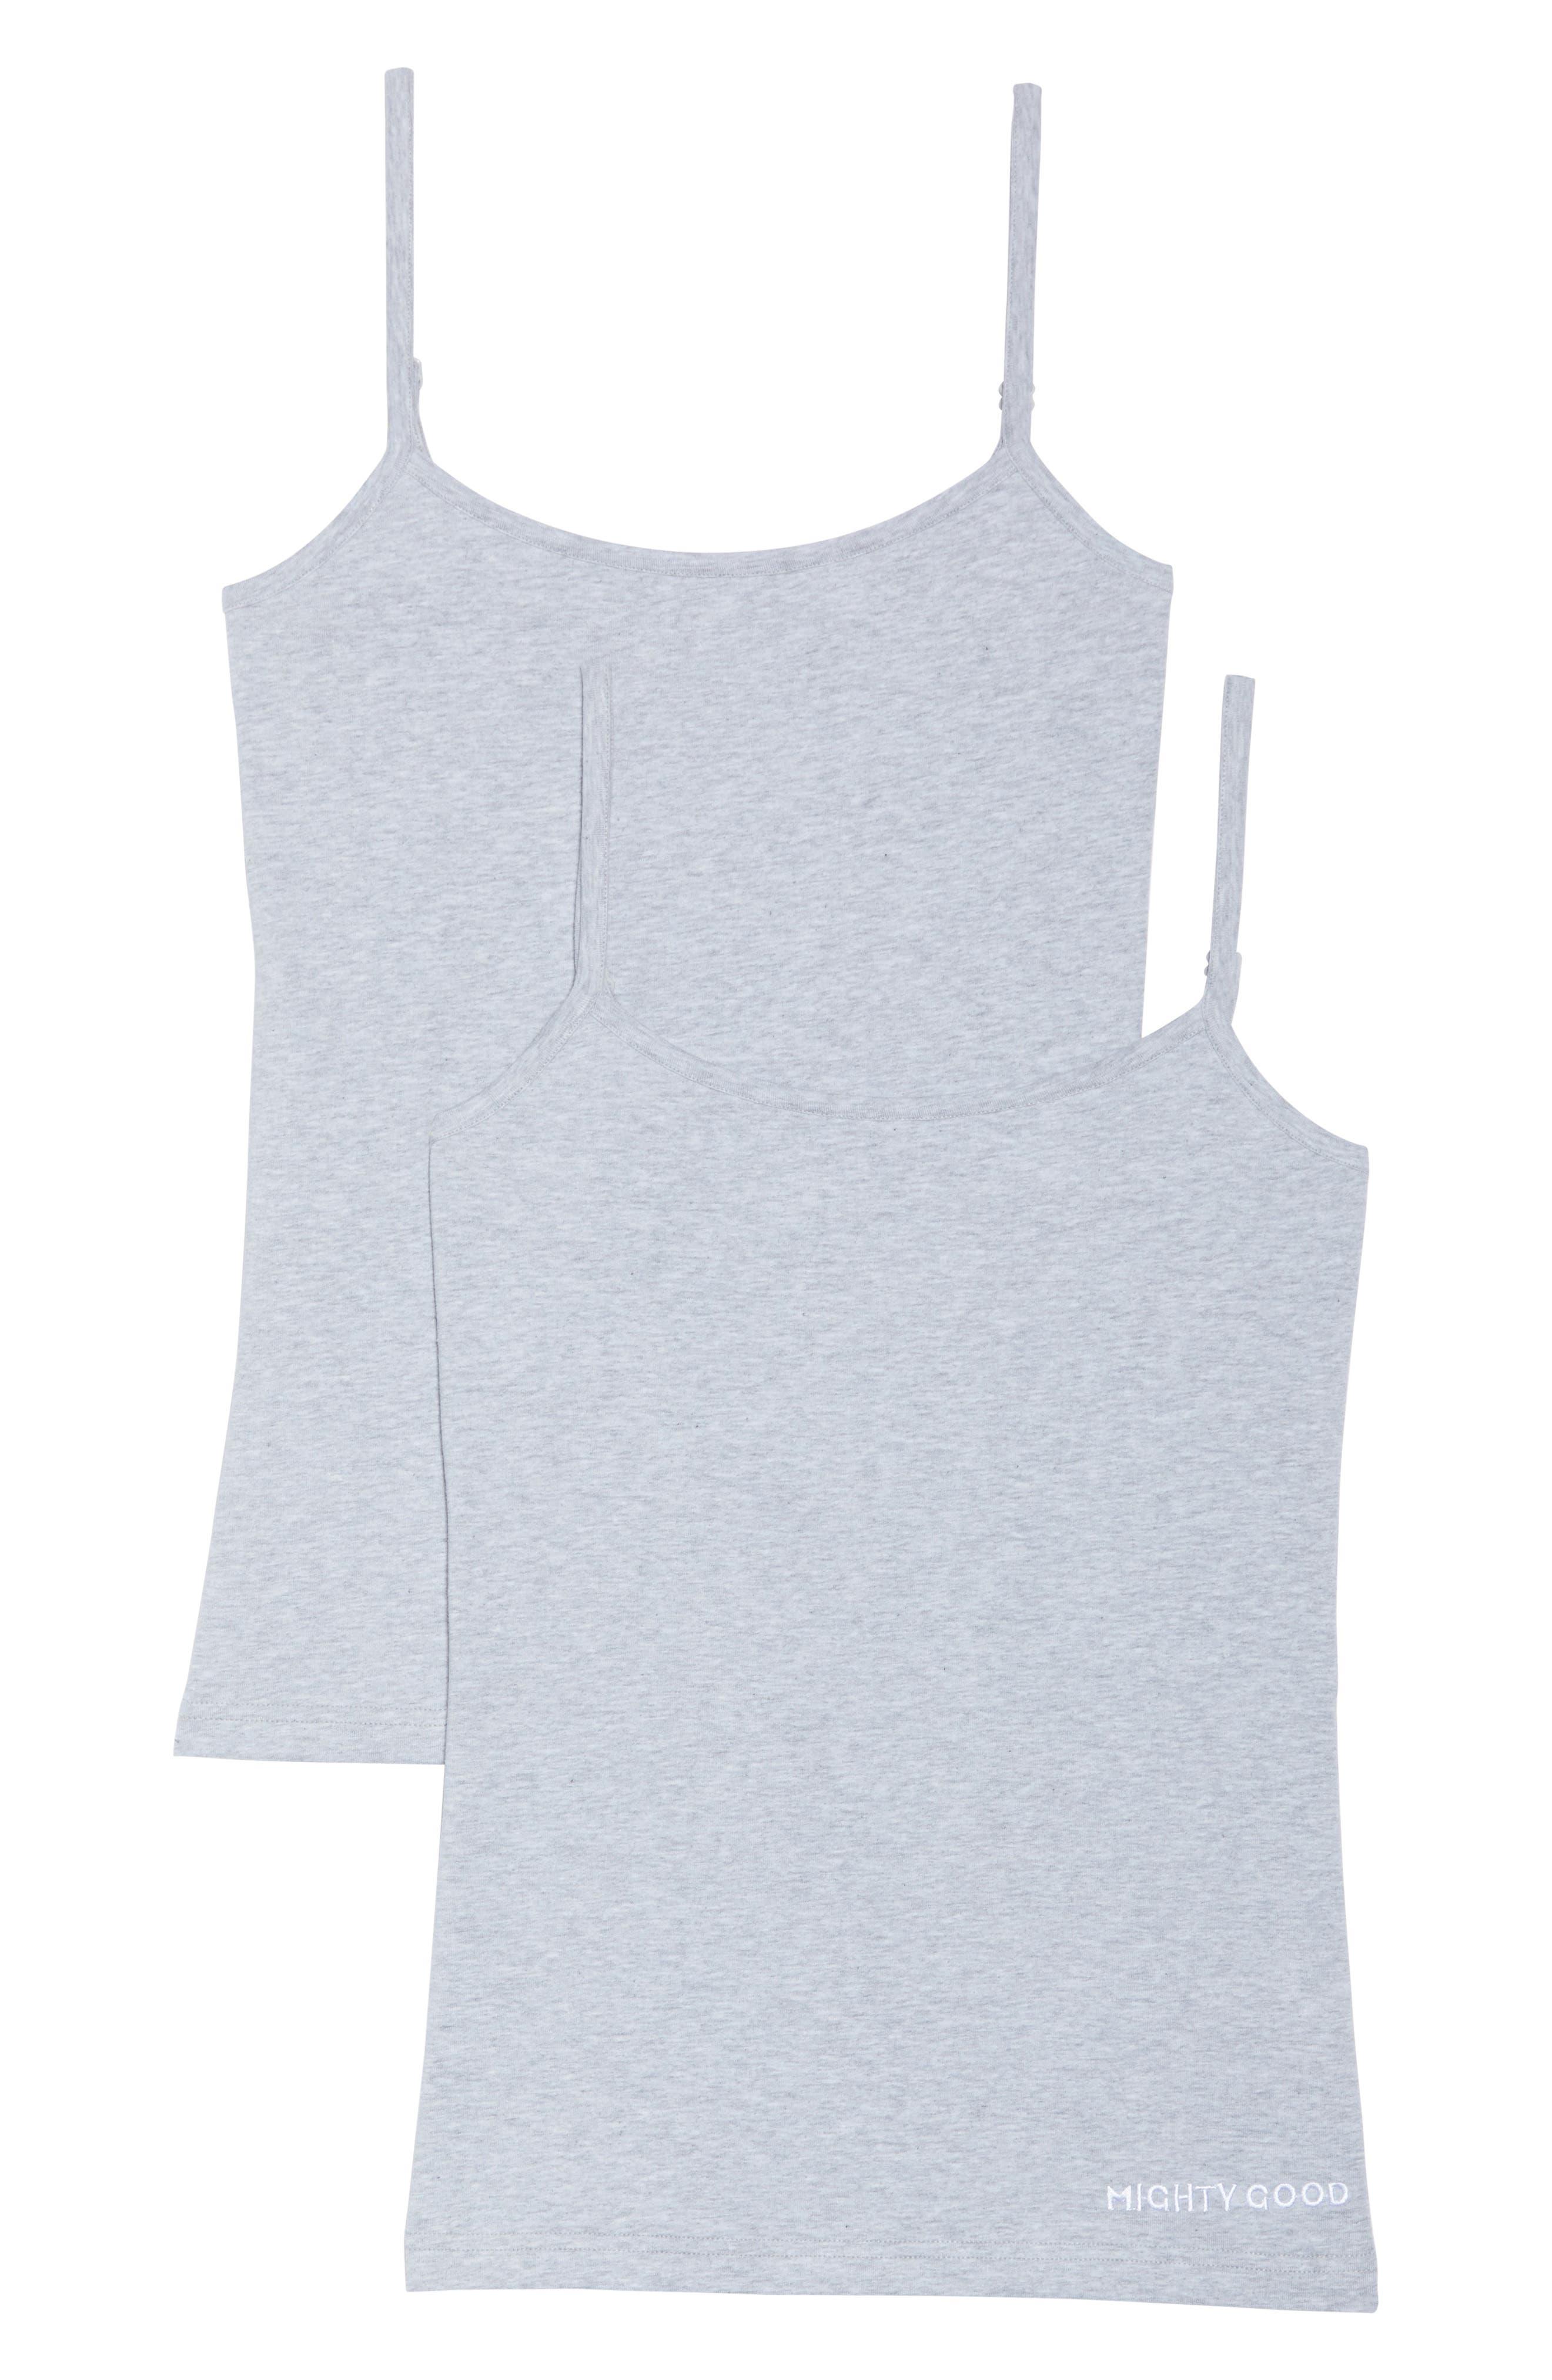 Mighty Good Undies 2-Pack Stretch Organic Cotton Camisoles